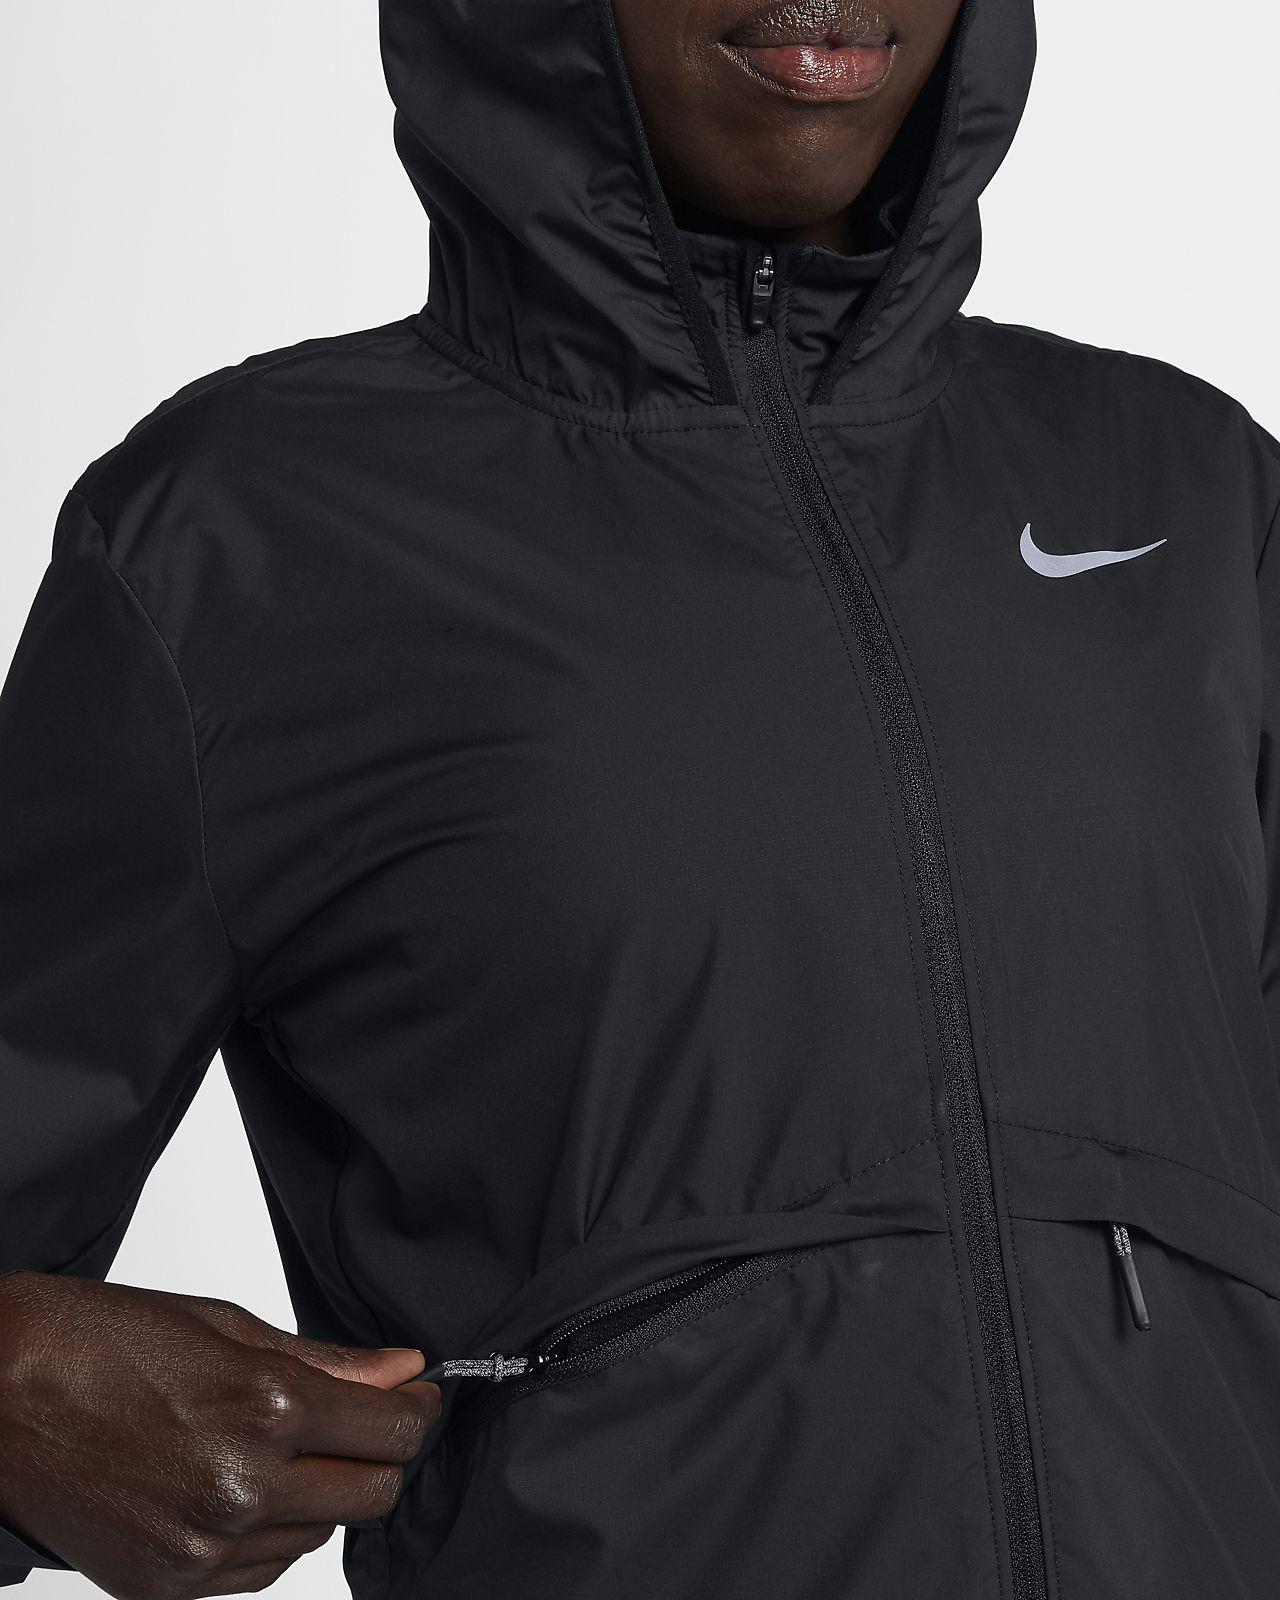 Nike Essential Chaqueta de running plegable para la lluvia Mujer